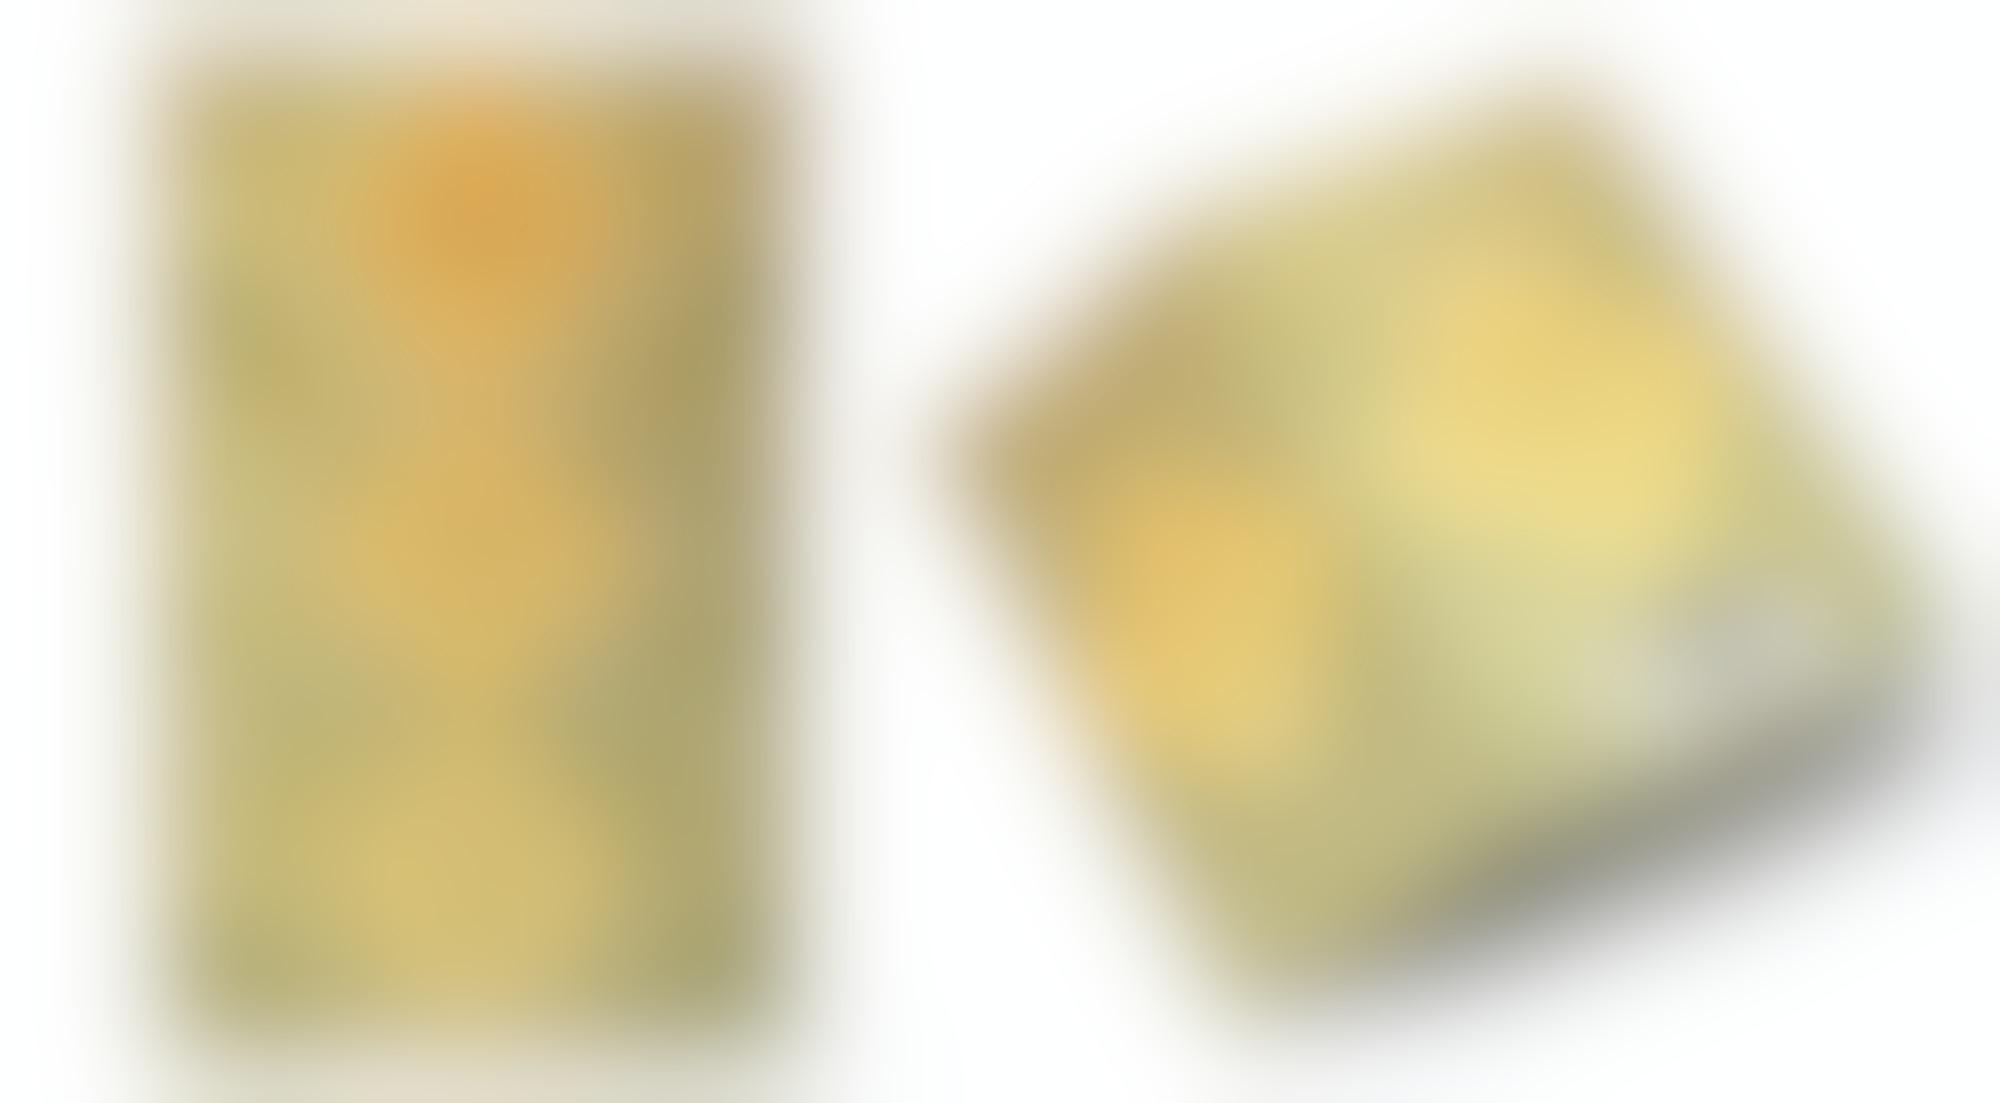 YT4 autocompressfitresizeixlibphp 1 1 0max h2000max w3 D2000q80s783c3a1bc9b96da4373f3985a25076ff